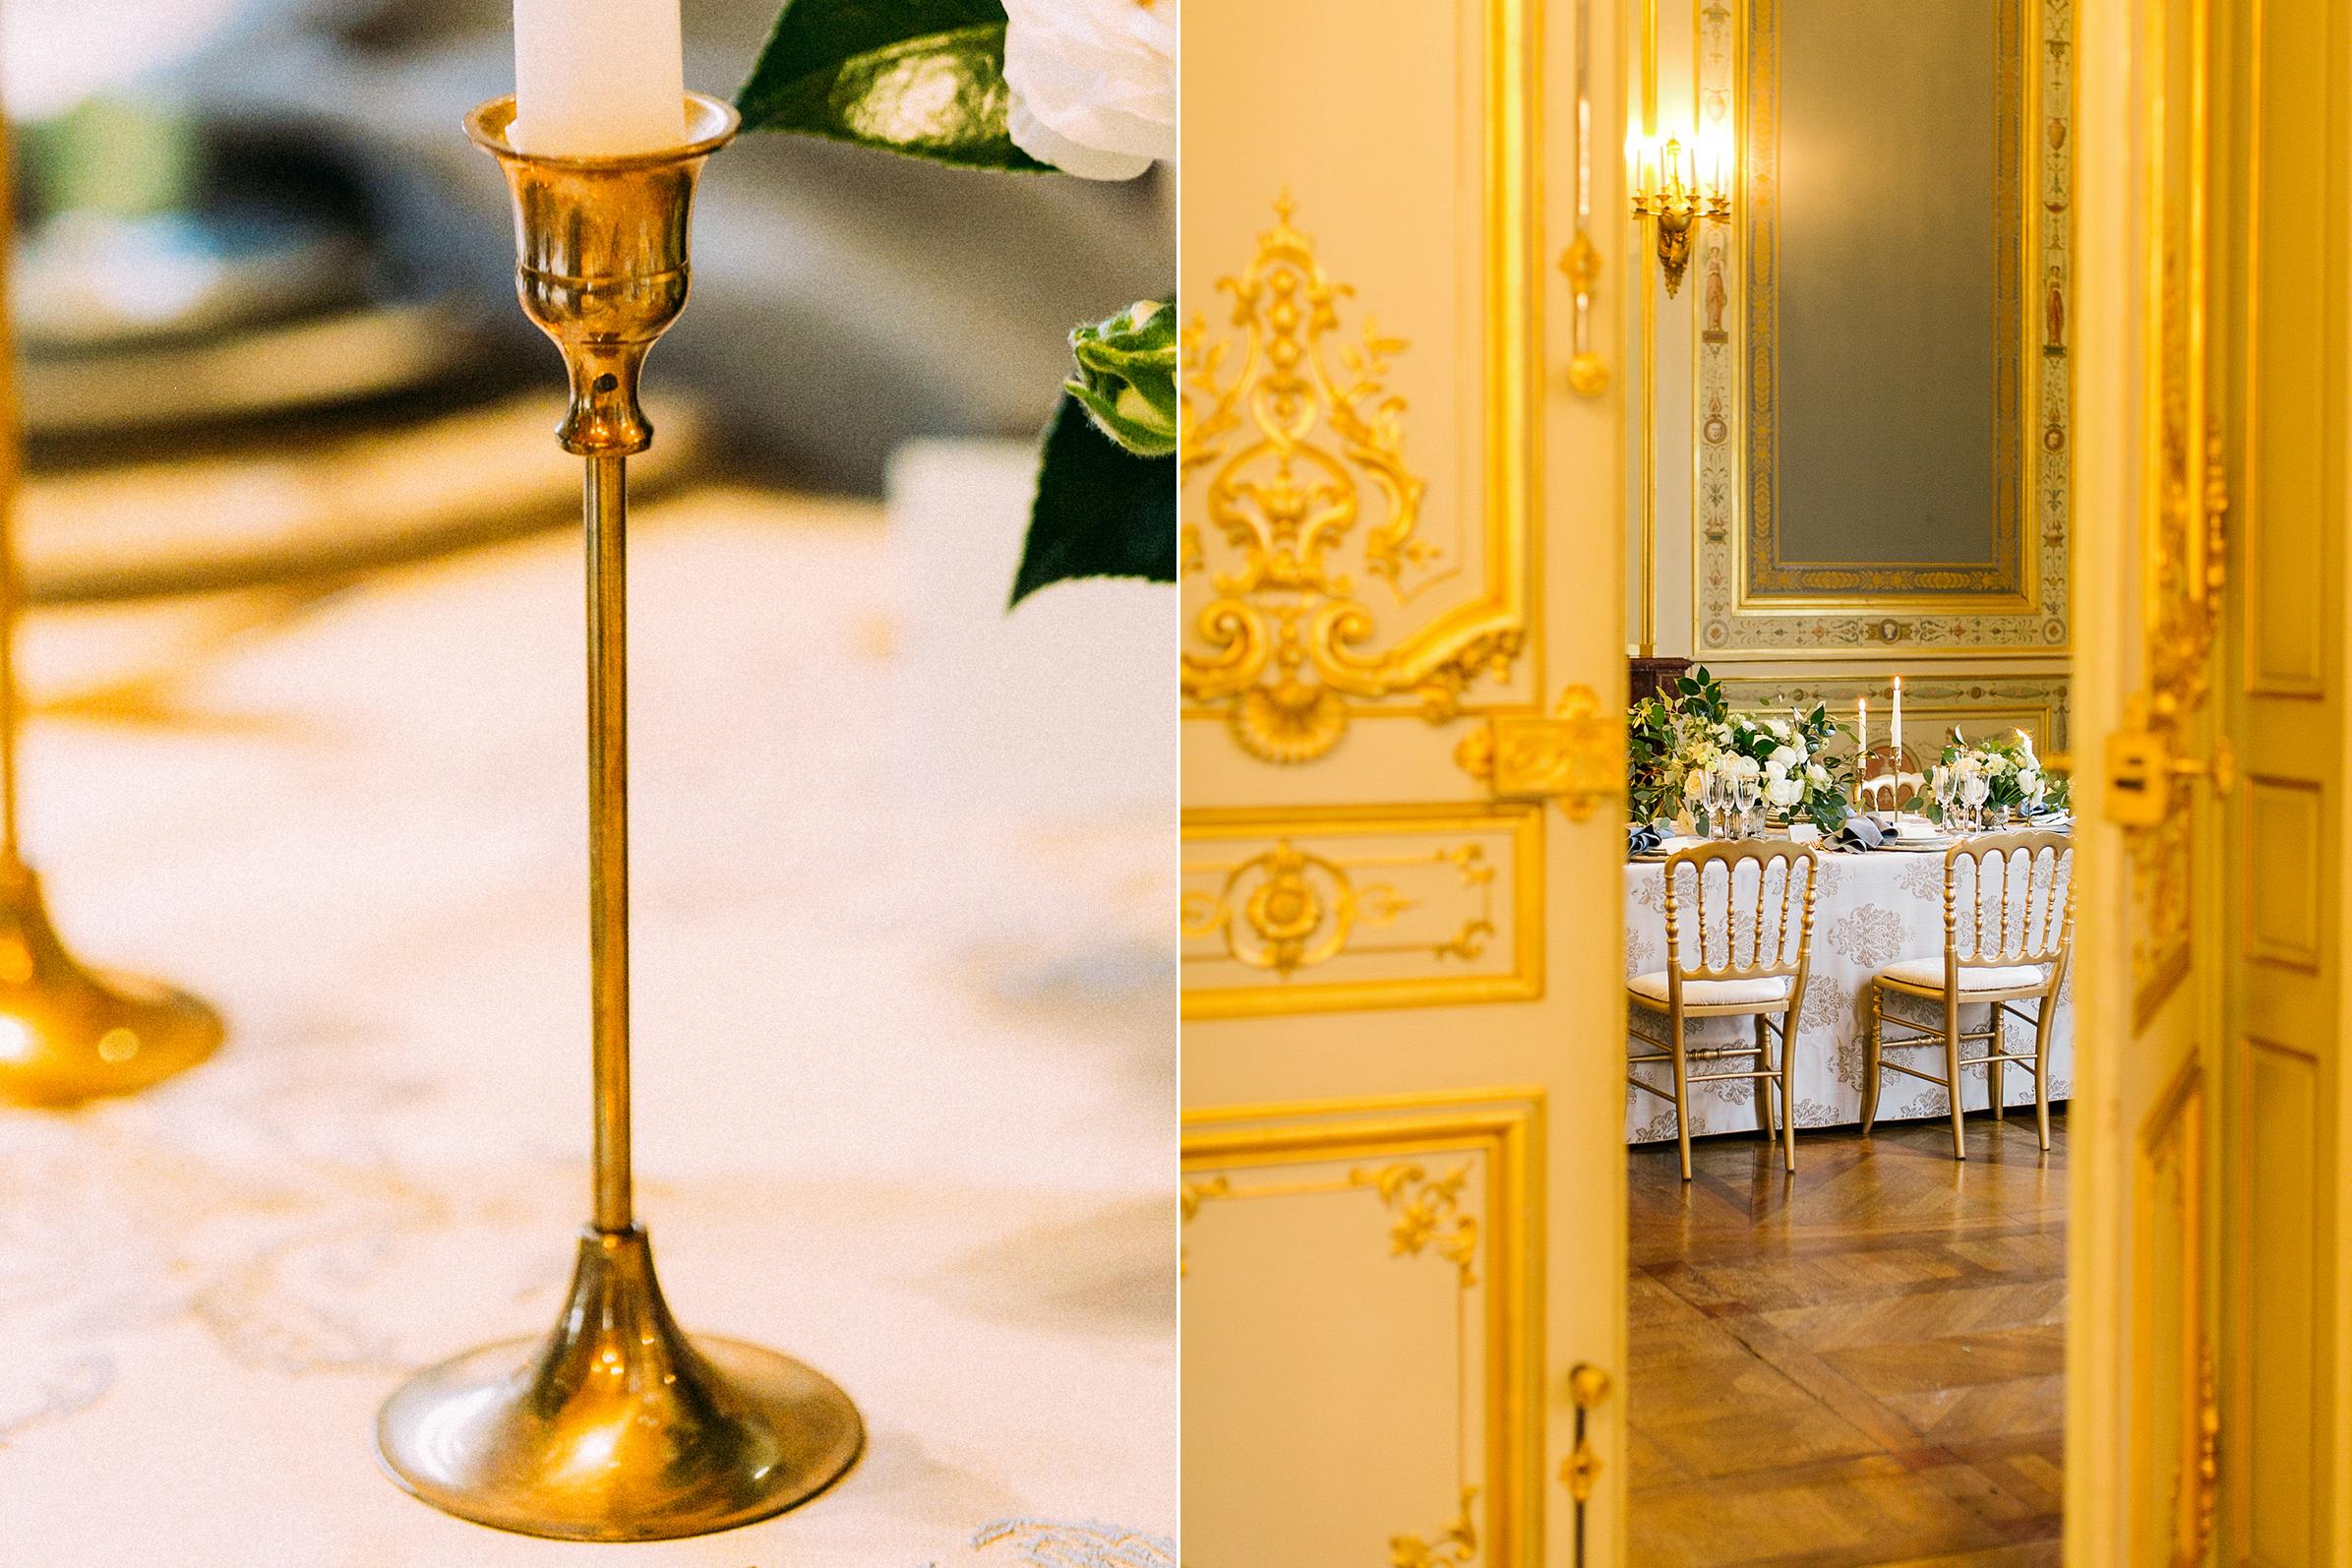 katie stoops photography-paris wedding-marchesa-cynthia martyn events15.jpg